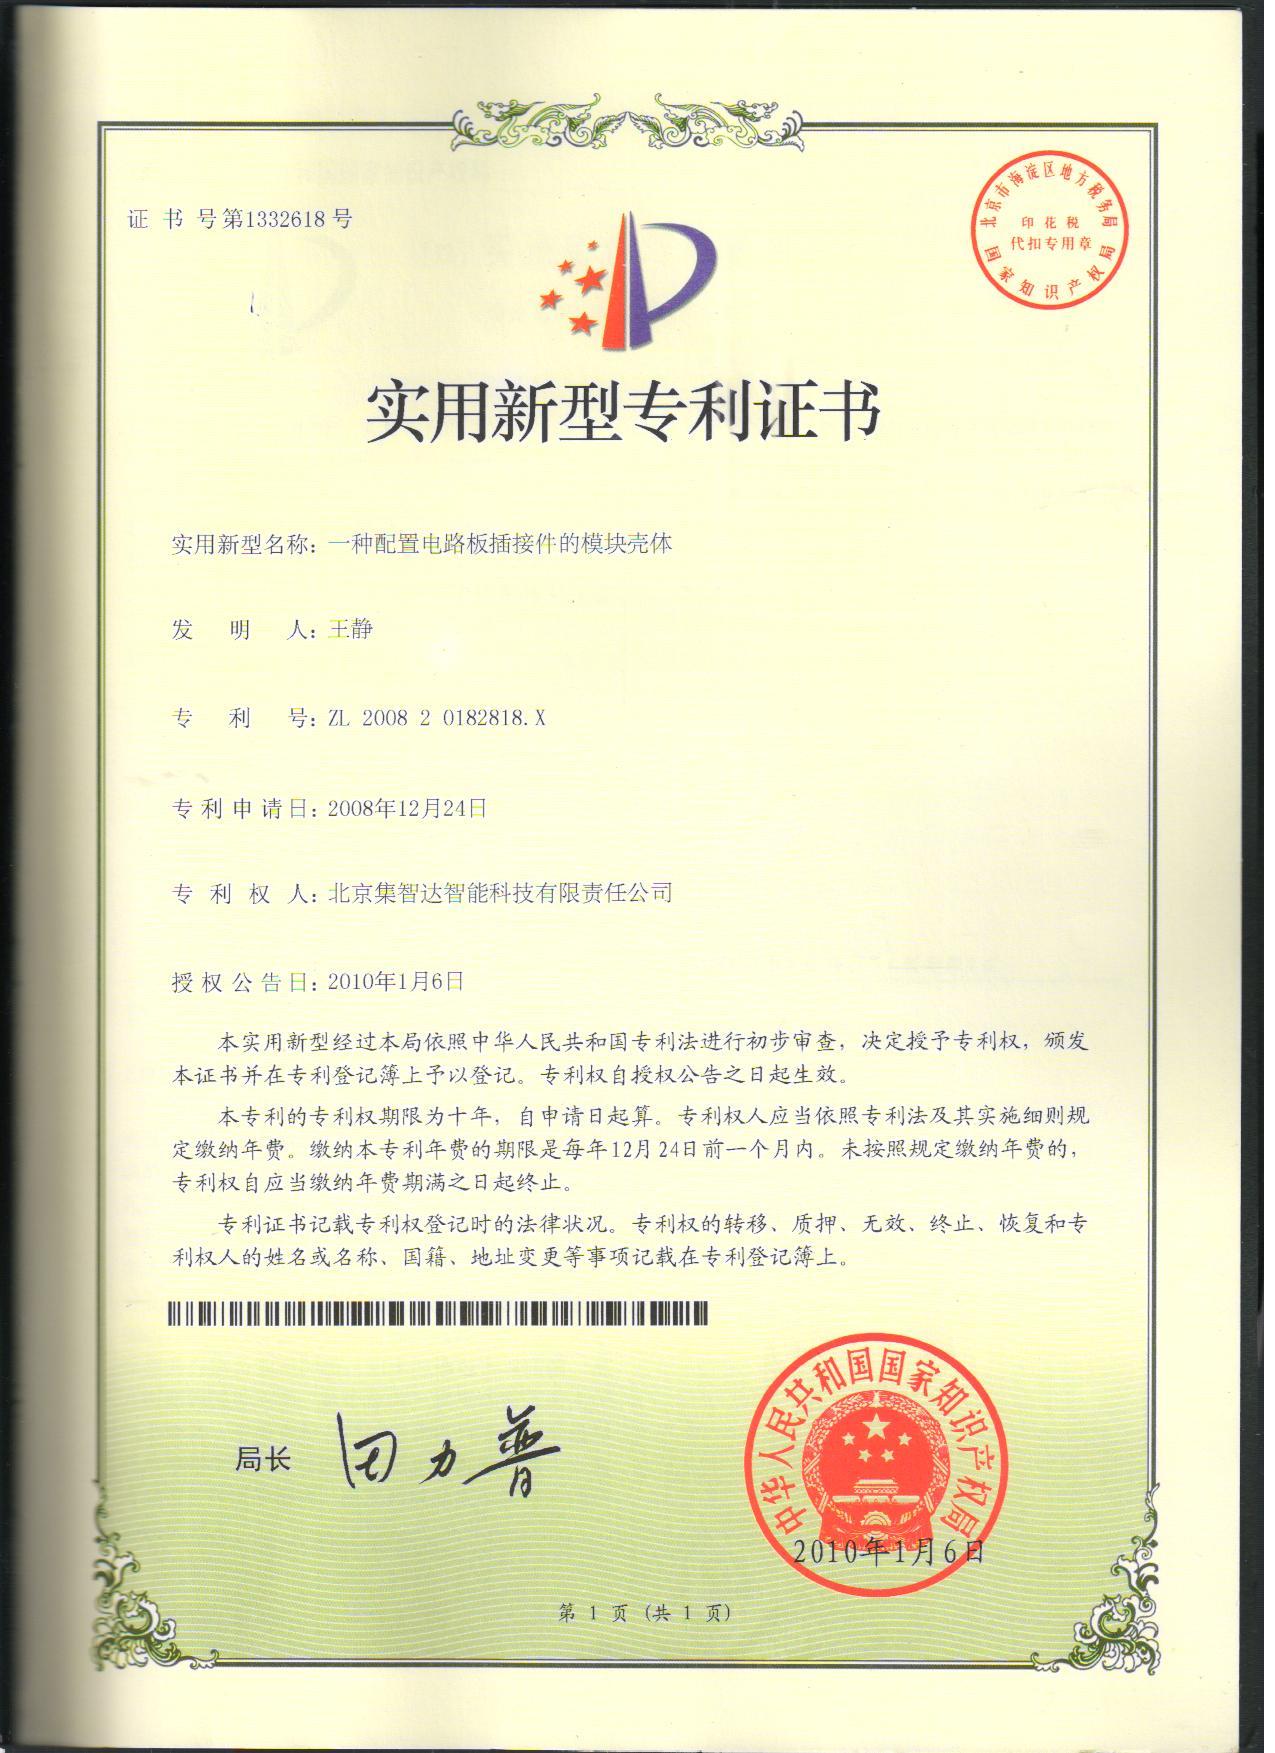 Utility Model Patent Certificate ZL 2008 2 0182818.X